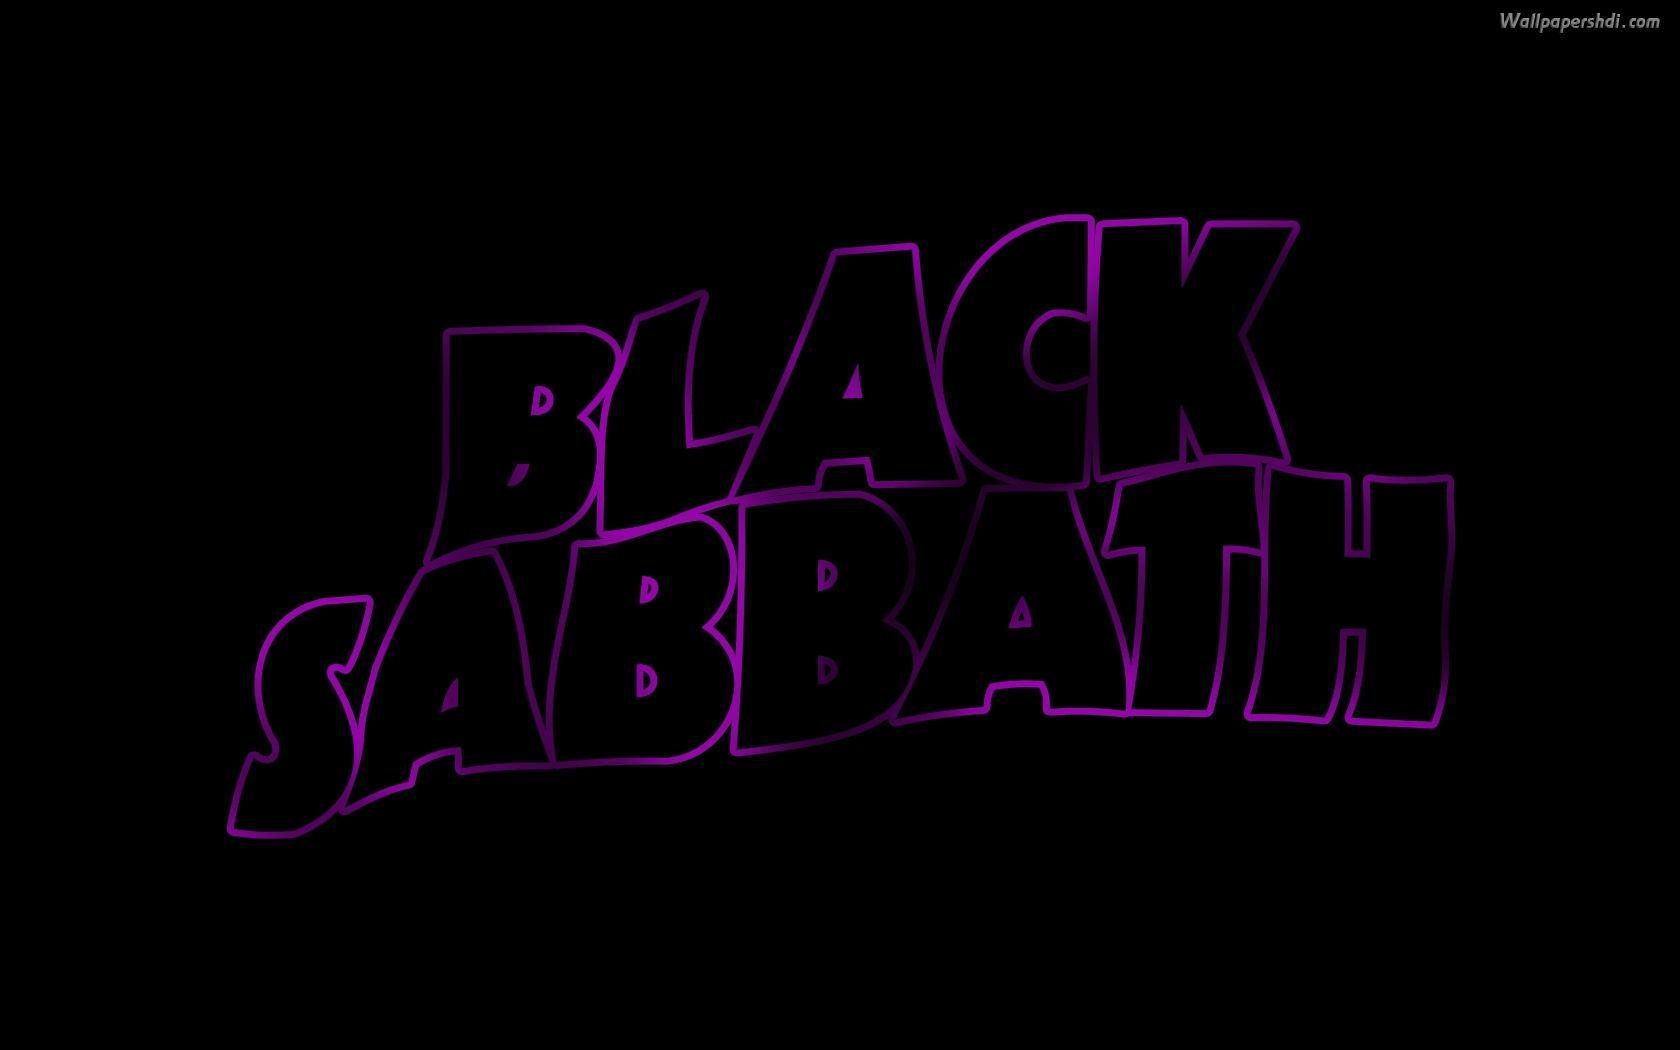 Black Sabbath Black Sabbath Metal Band Wallpaper Band Wallpapers